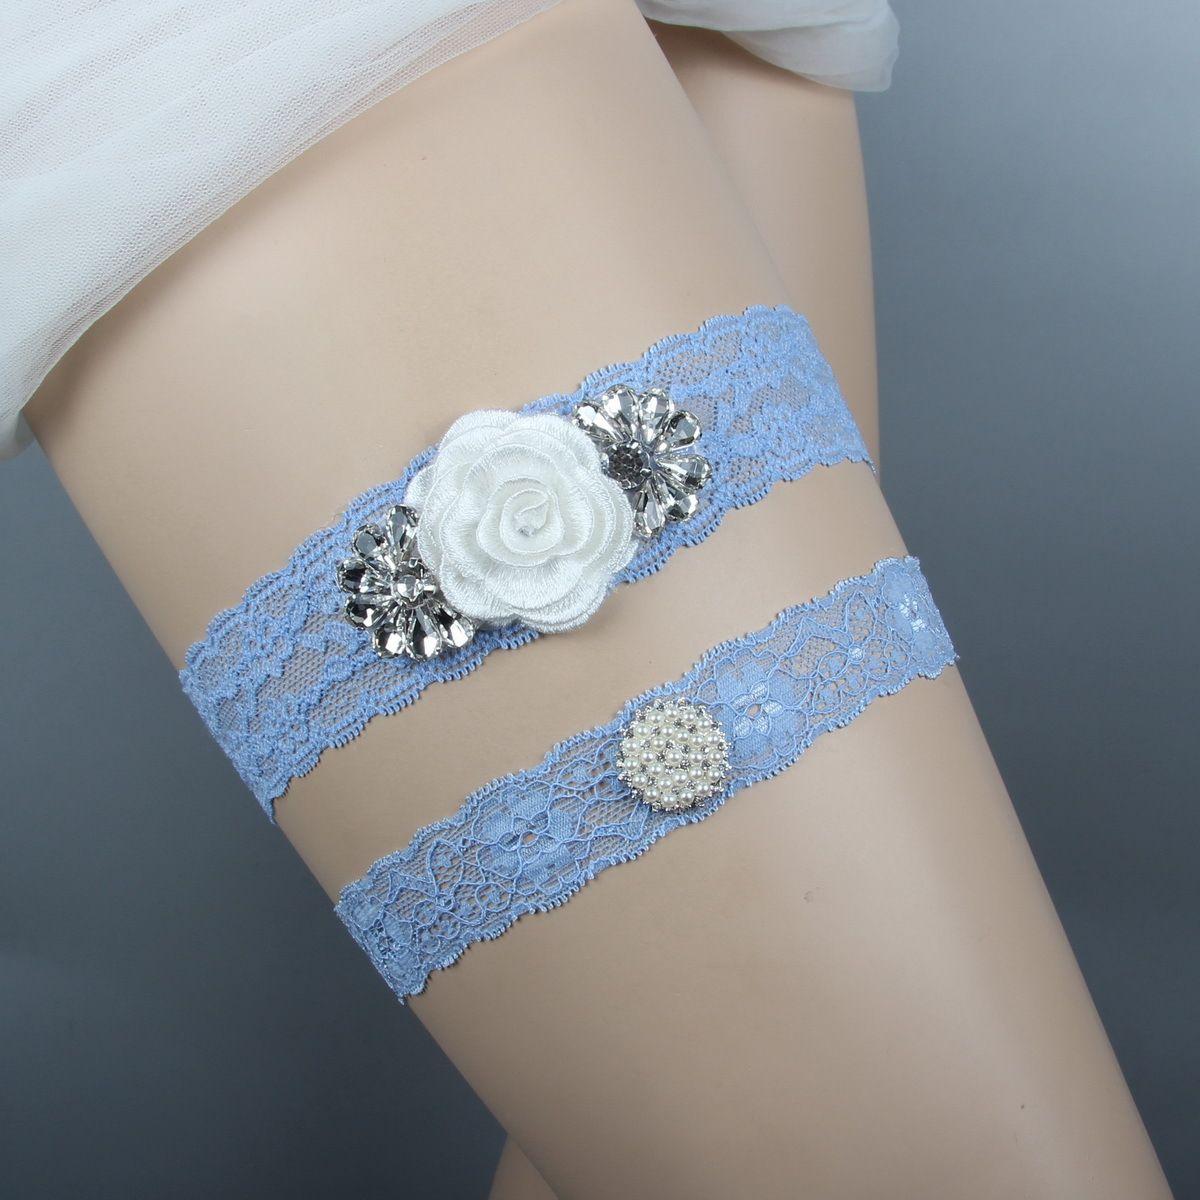 Where To Buy A Garter For Wedding: Wedding Garters For Bride Blue Bridal Leg Garters Belt Set